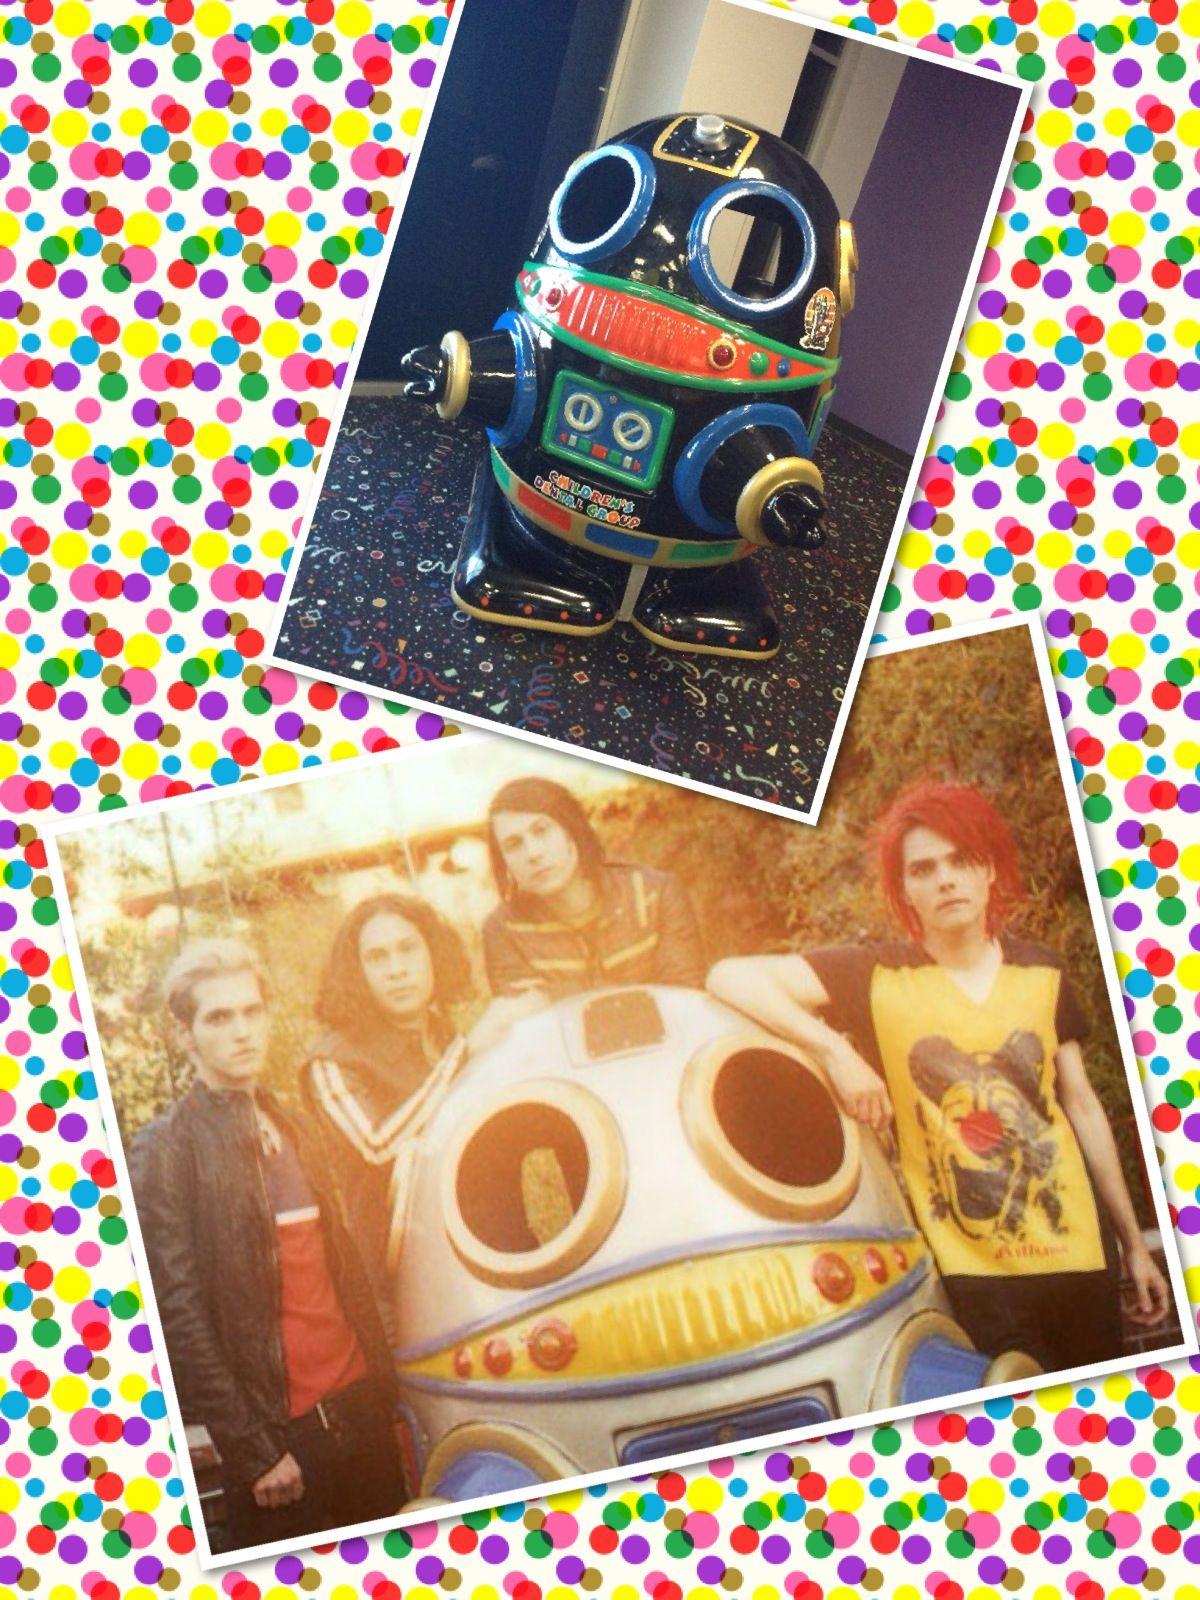 Same robot! OMGee!